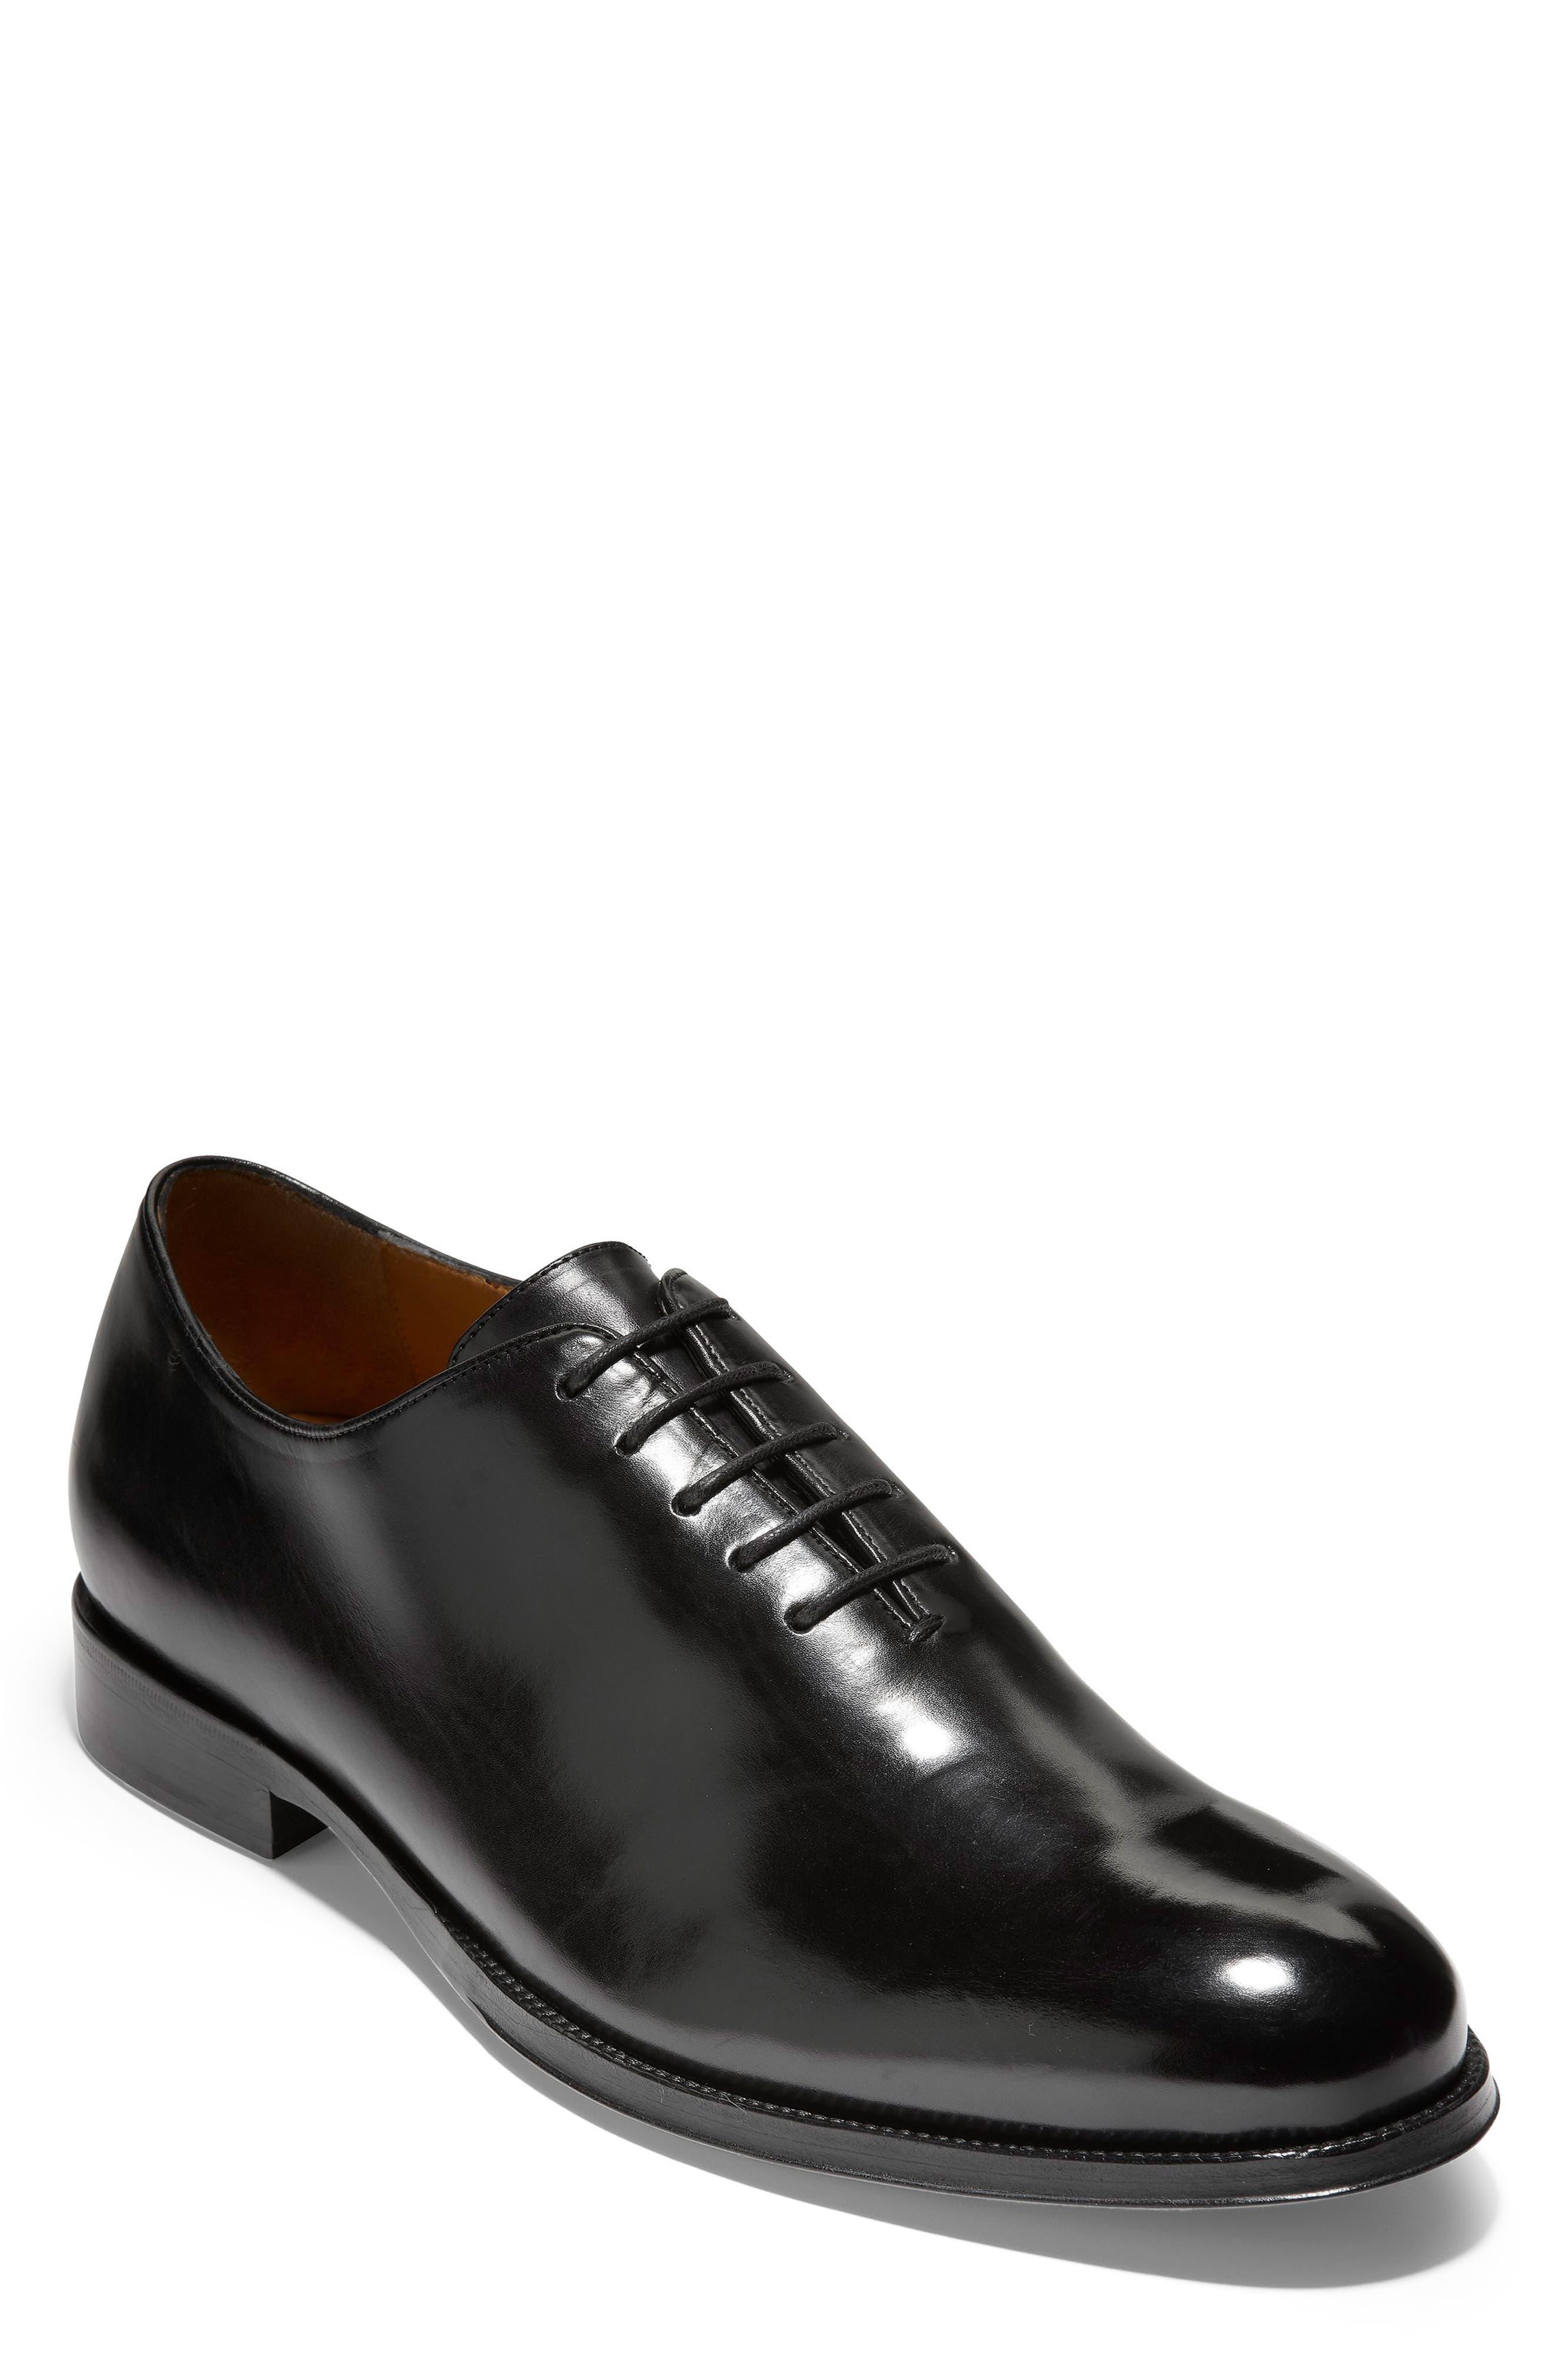 COLE HAAN American Classics Gramercy Whole Cut Shoe, Main, color, BLACK LEATHER